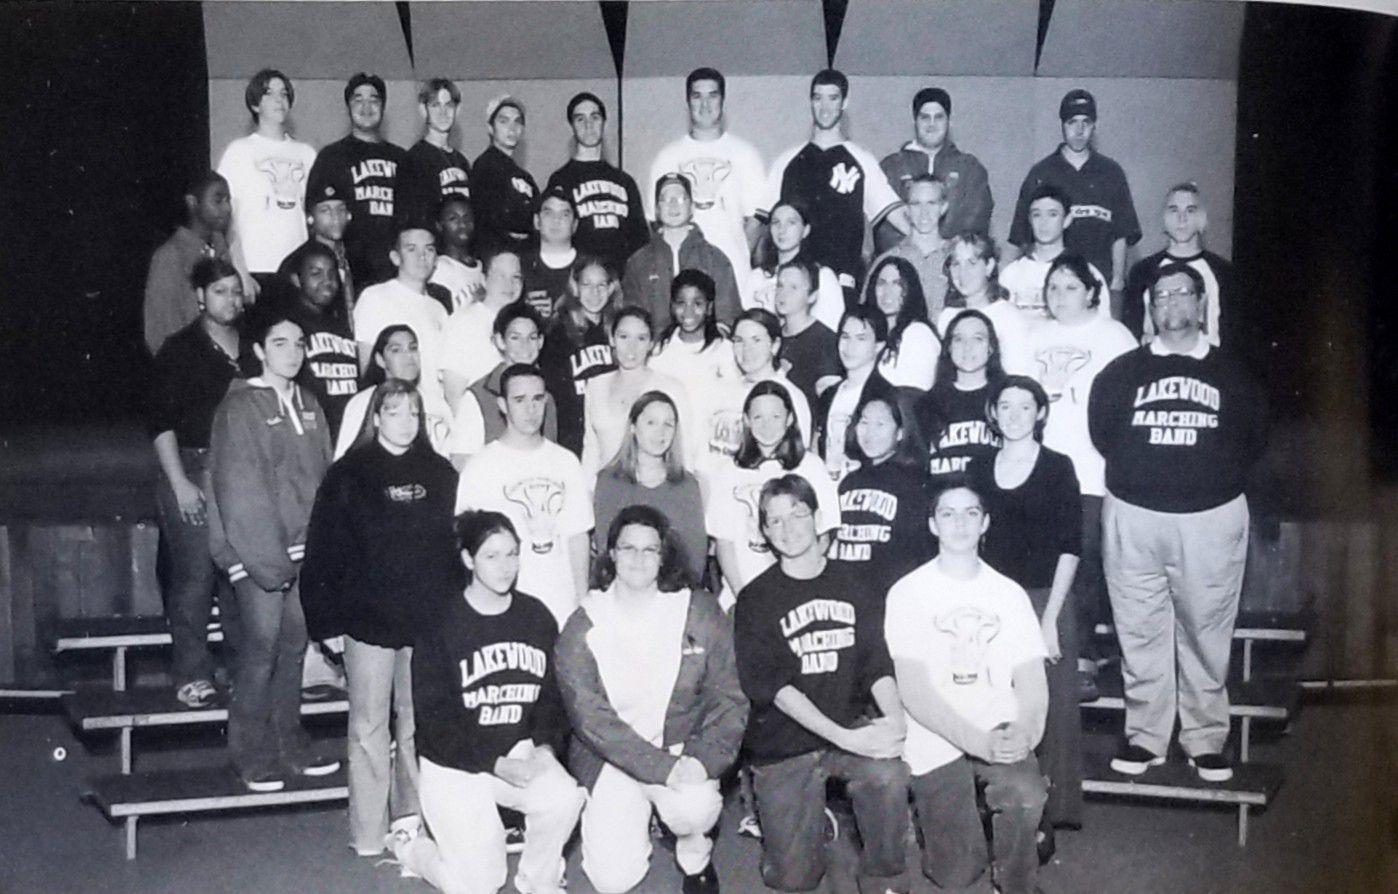 1999 lakewood marching band group photo wo caption